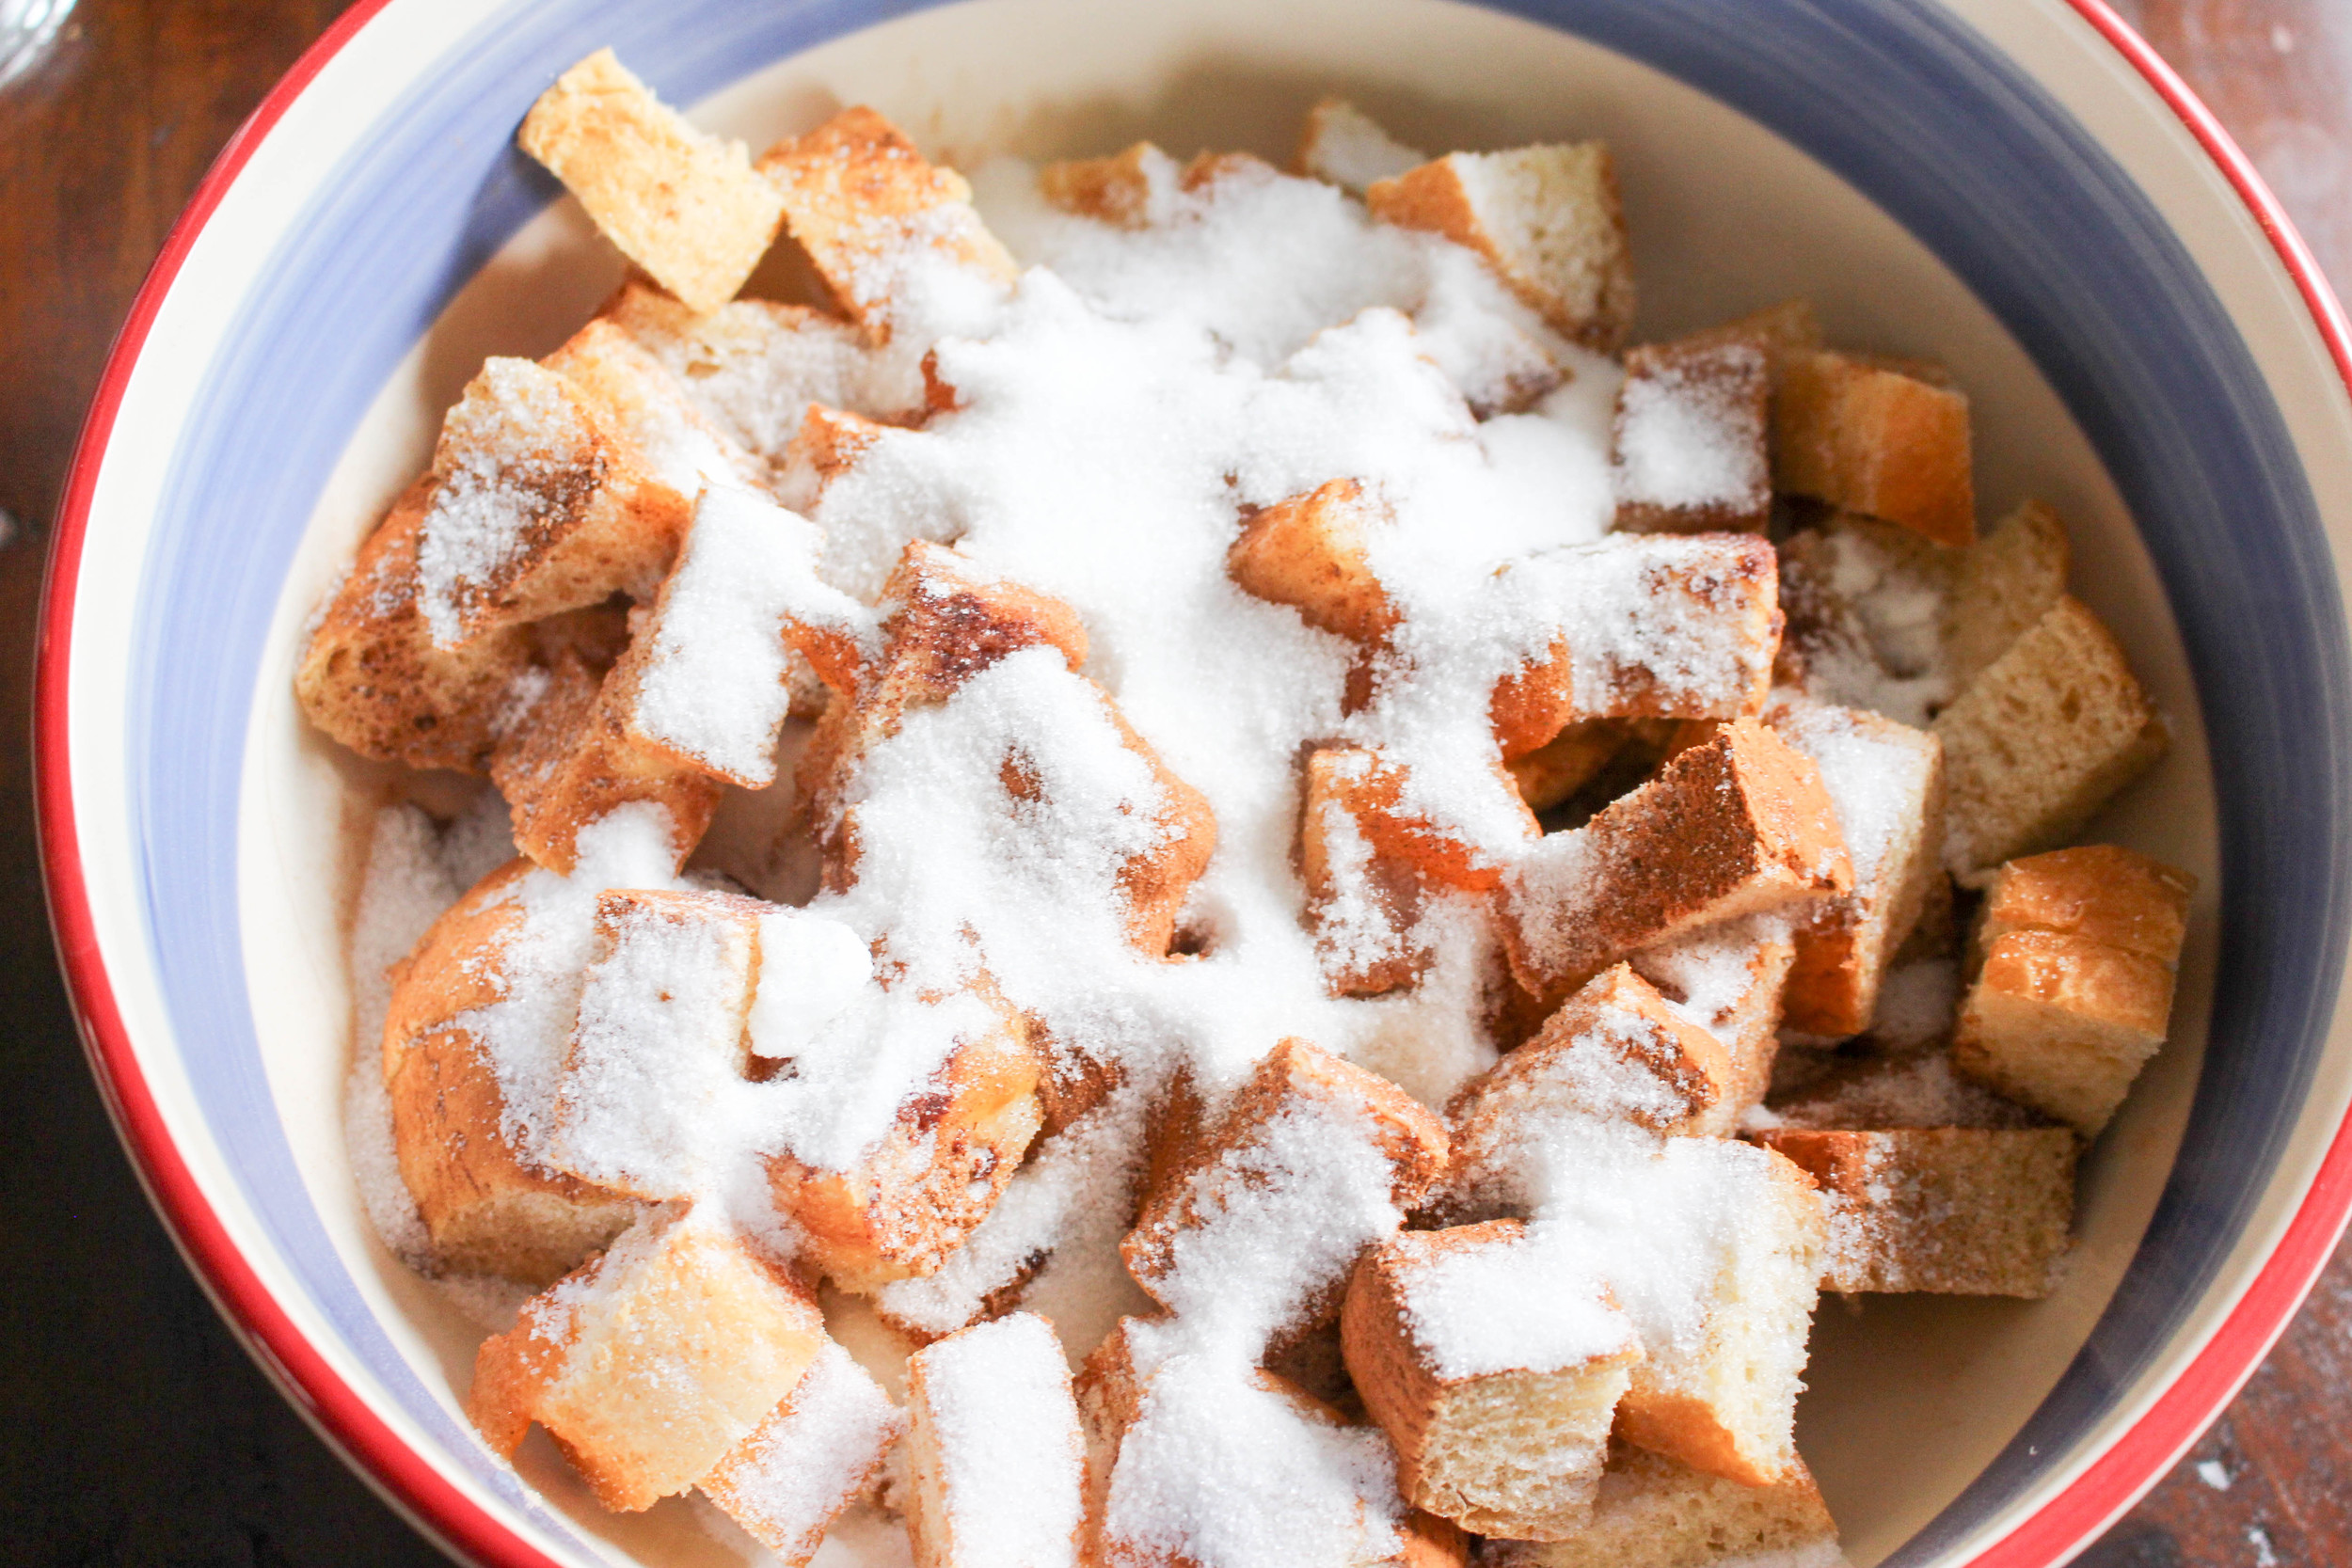 Cinnamon Sweet Stuffing